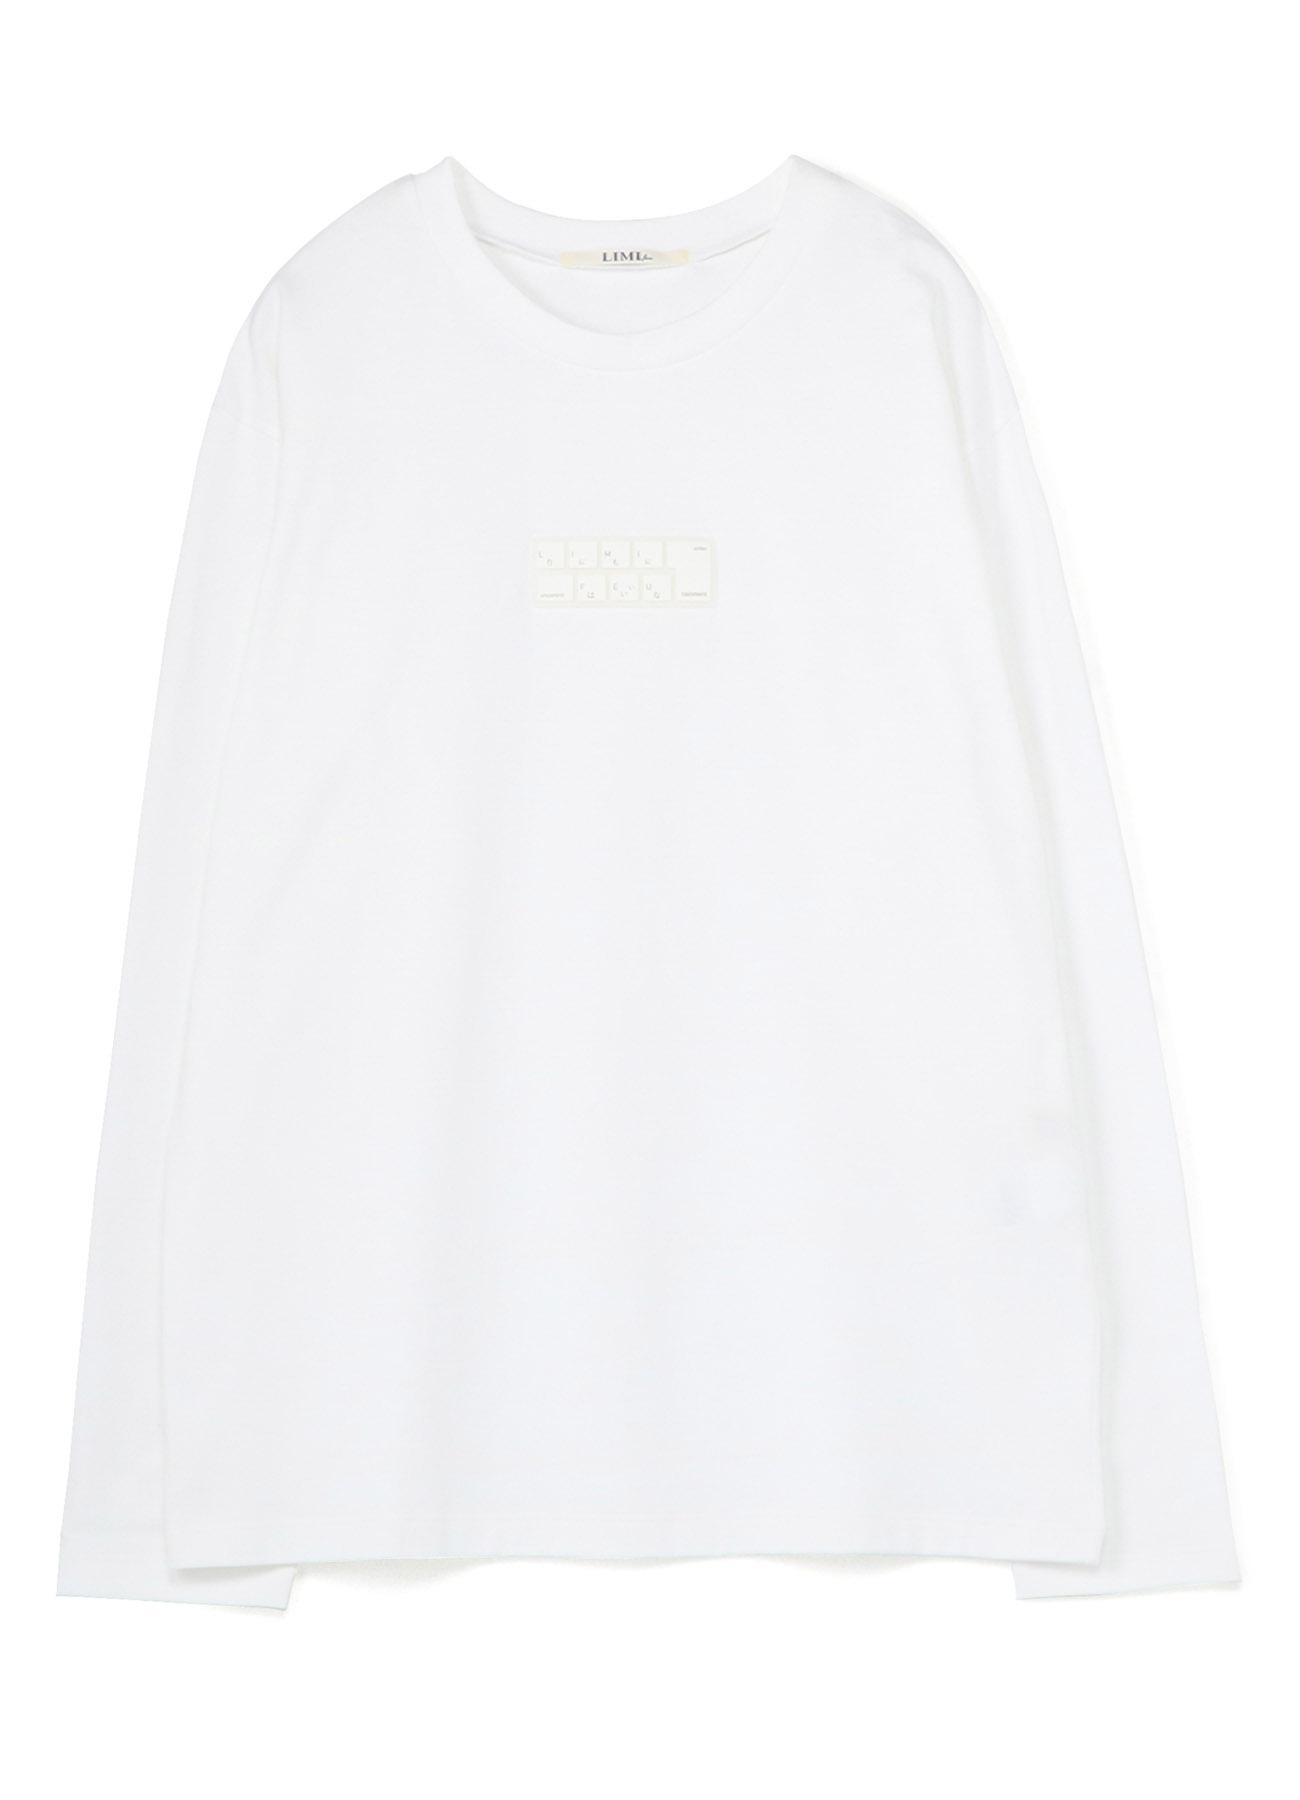 Silicon KeyBoard Oversized Long T-Shirt